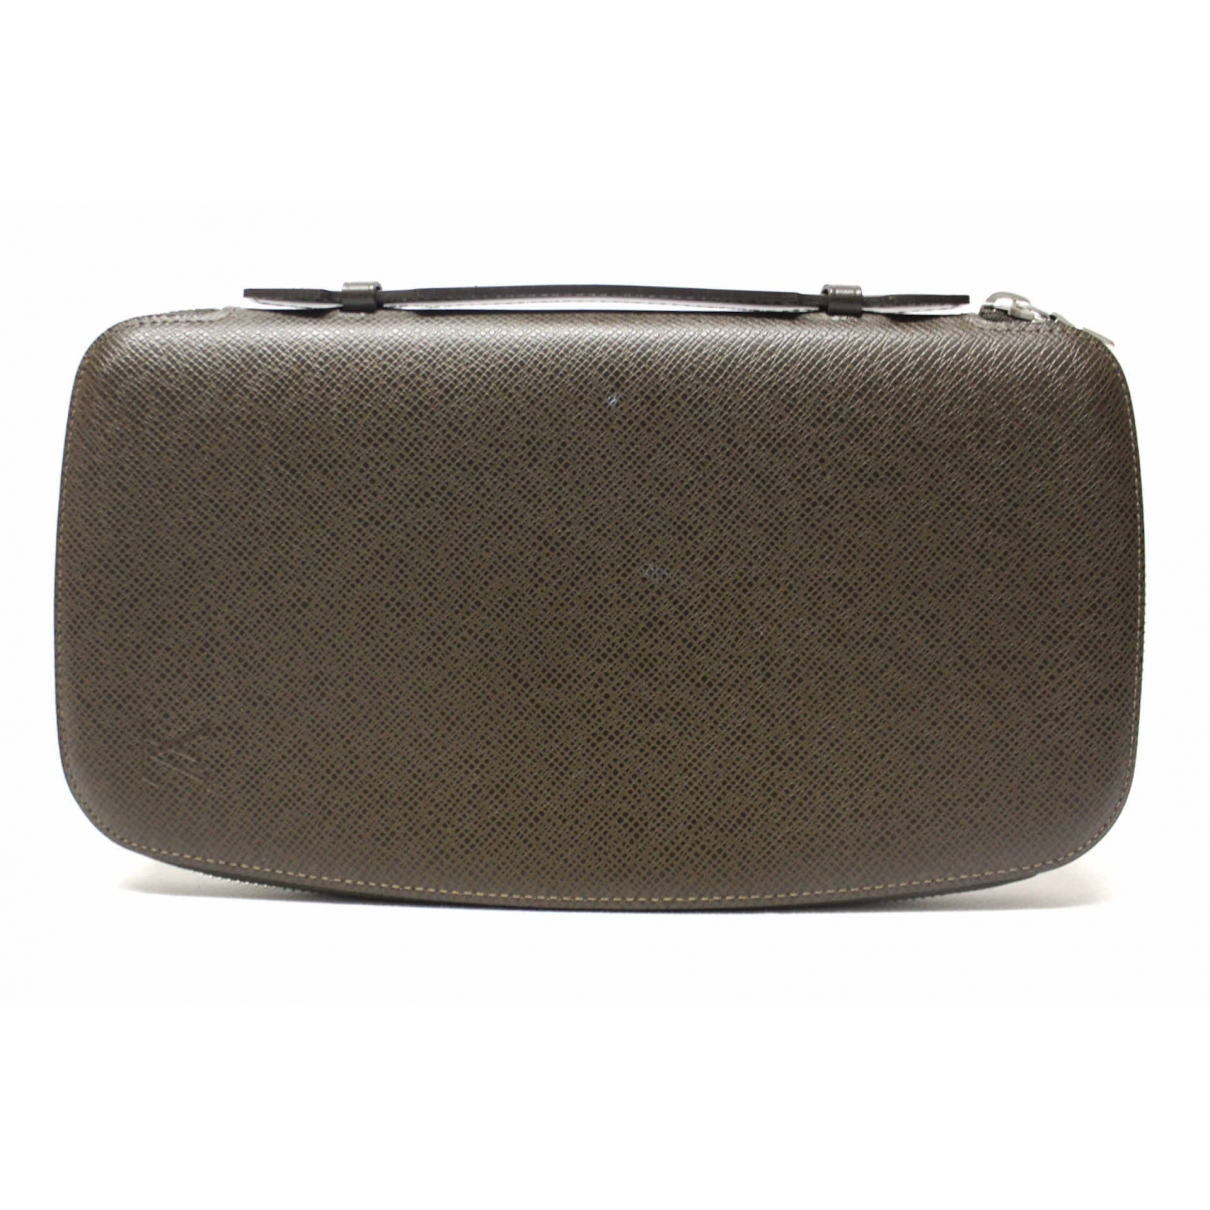 Louis Vuitton \N Portemonnaie in  Braun Leder